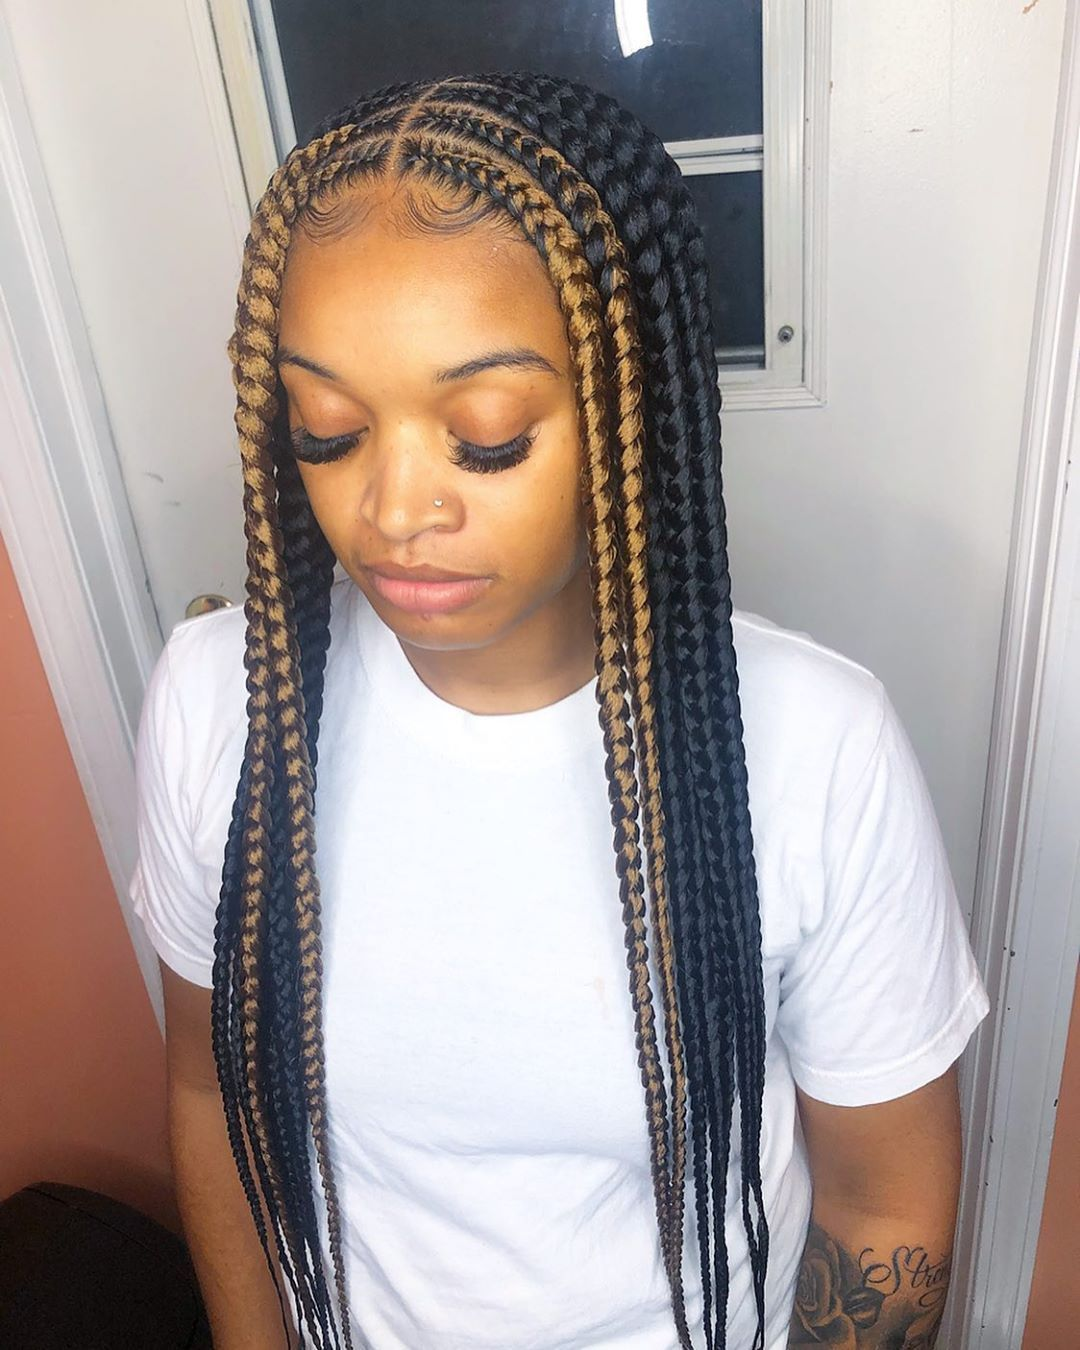 Braided Hairstyles In Kenya 2019 Braided Hair Vacation Braided Hairstyles 2018 Black Female B Cornrow Hairstyles Braided Hairstyles Kids Braided Hairstyles